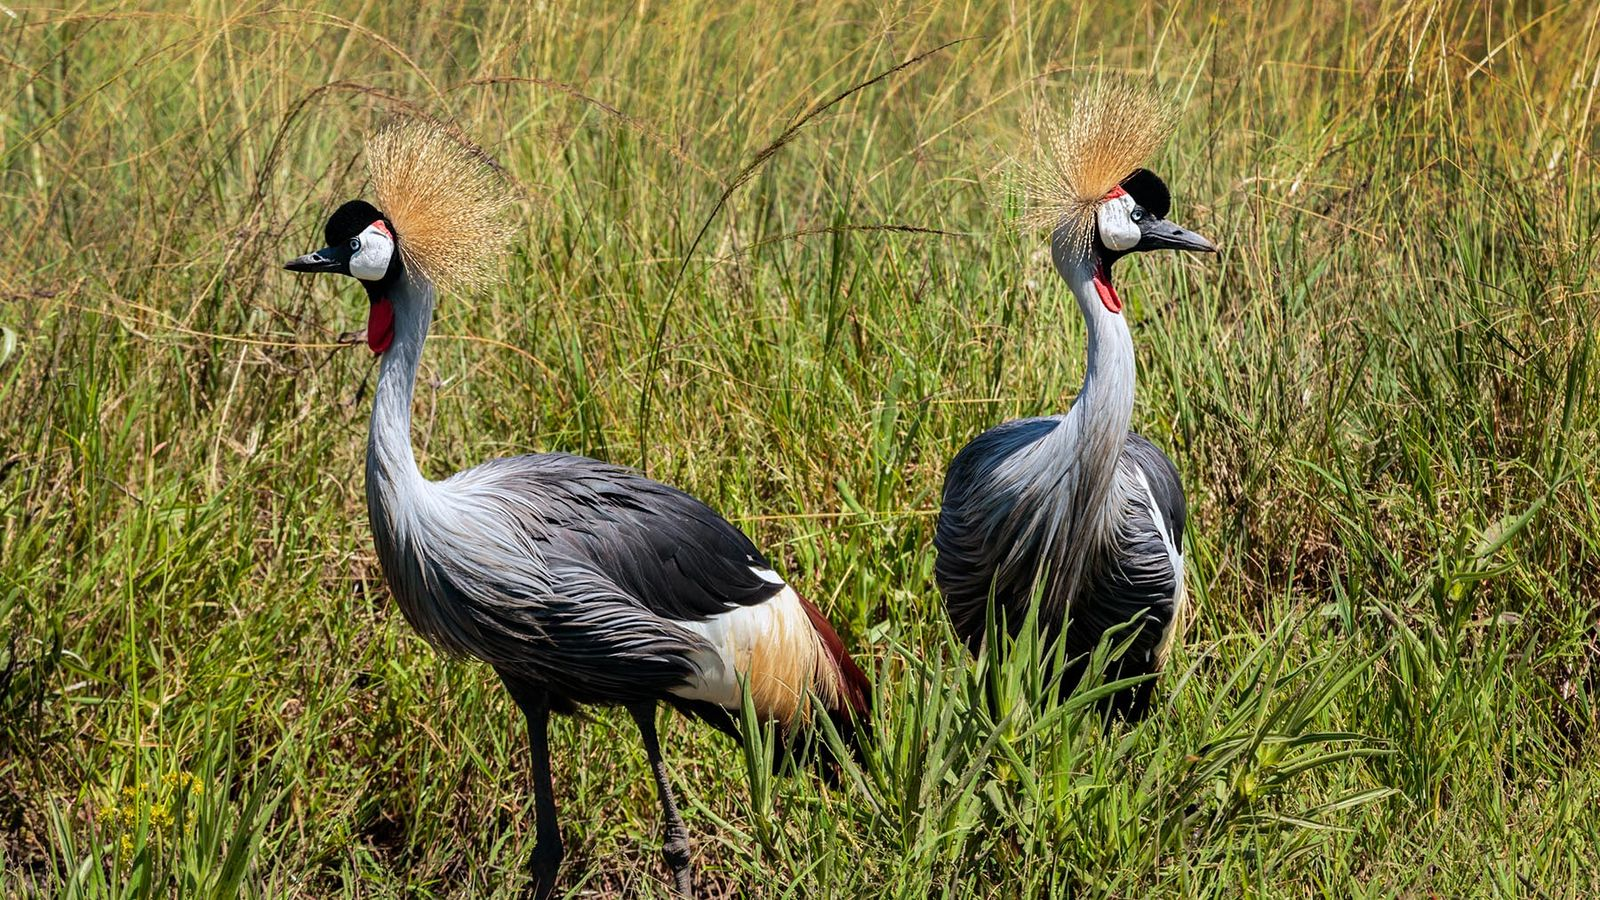 14 DAYS - WONDERS OF UGANDA